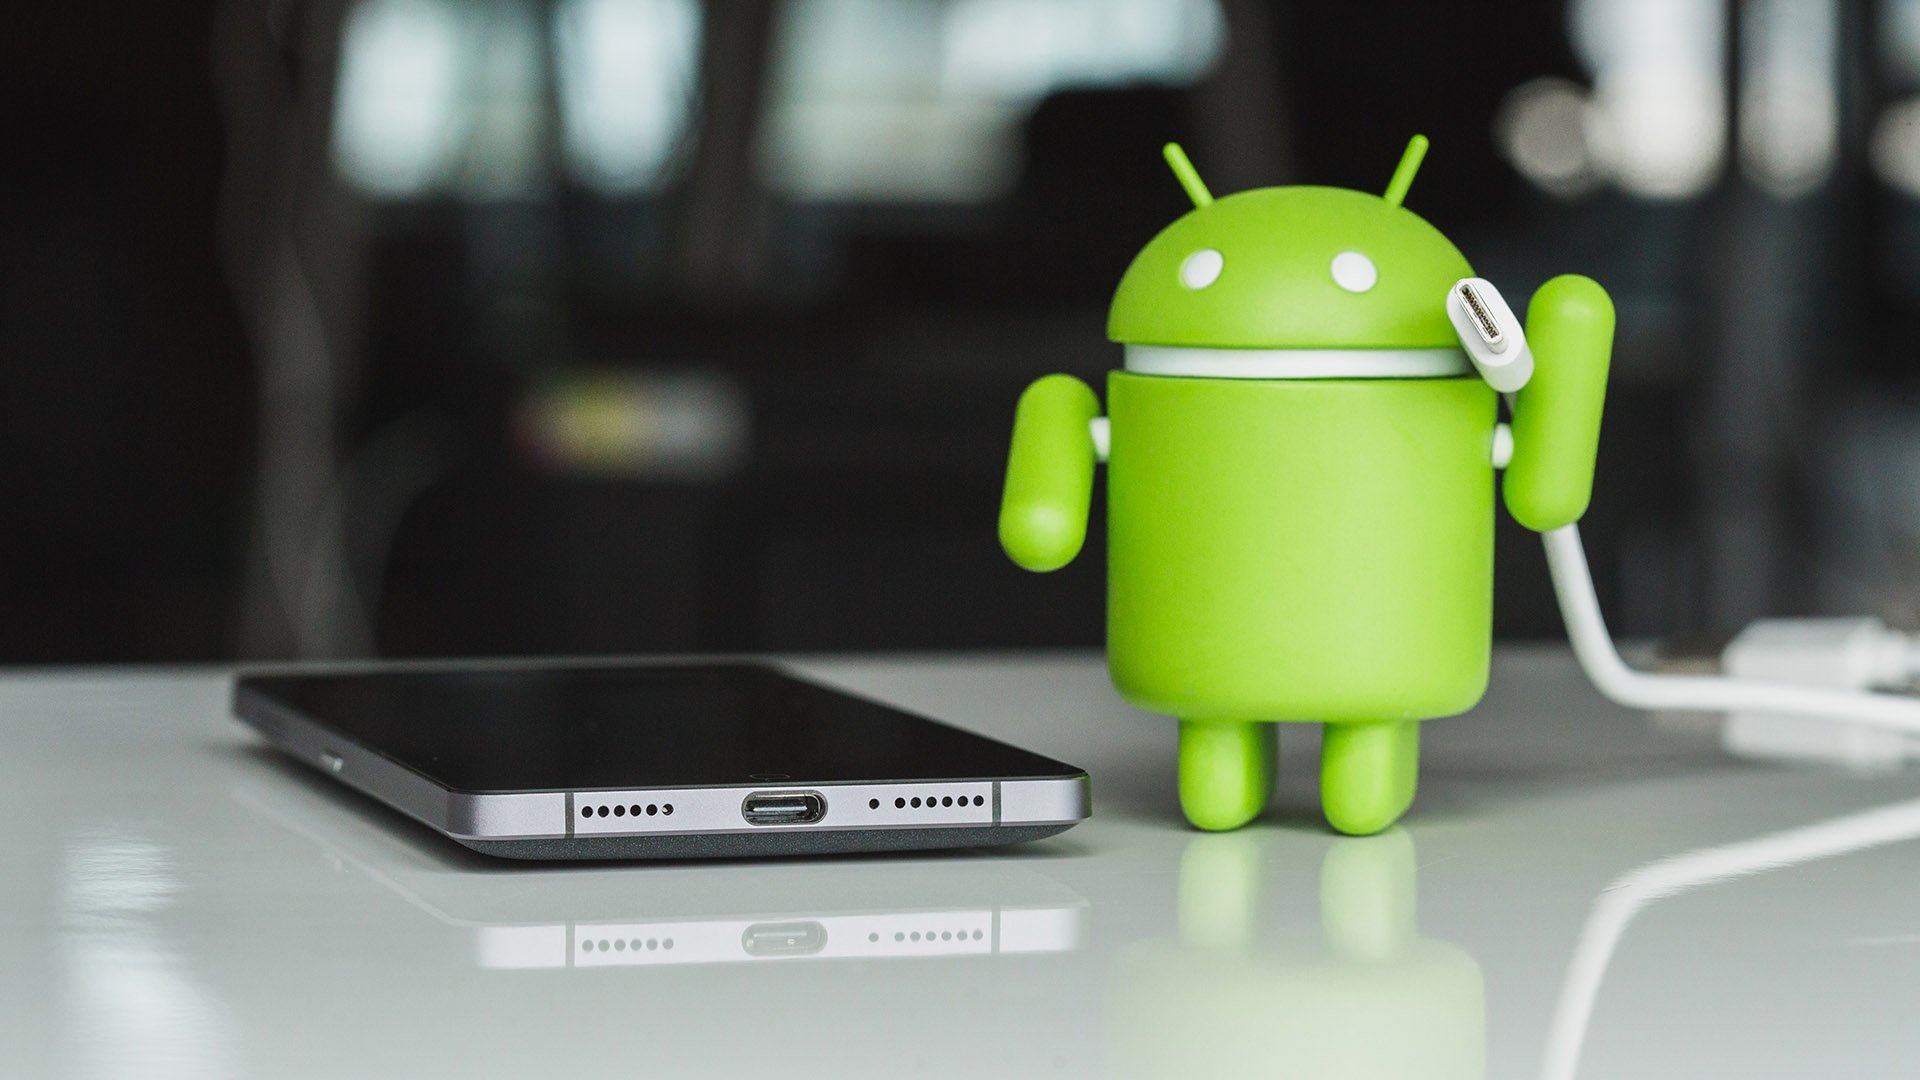 Il suffit de brancher l'application Android